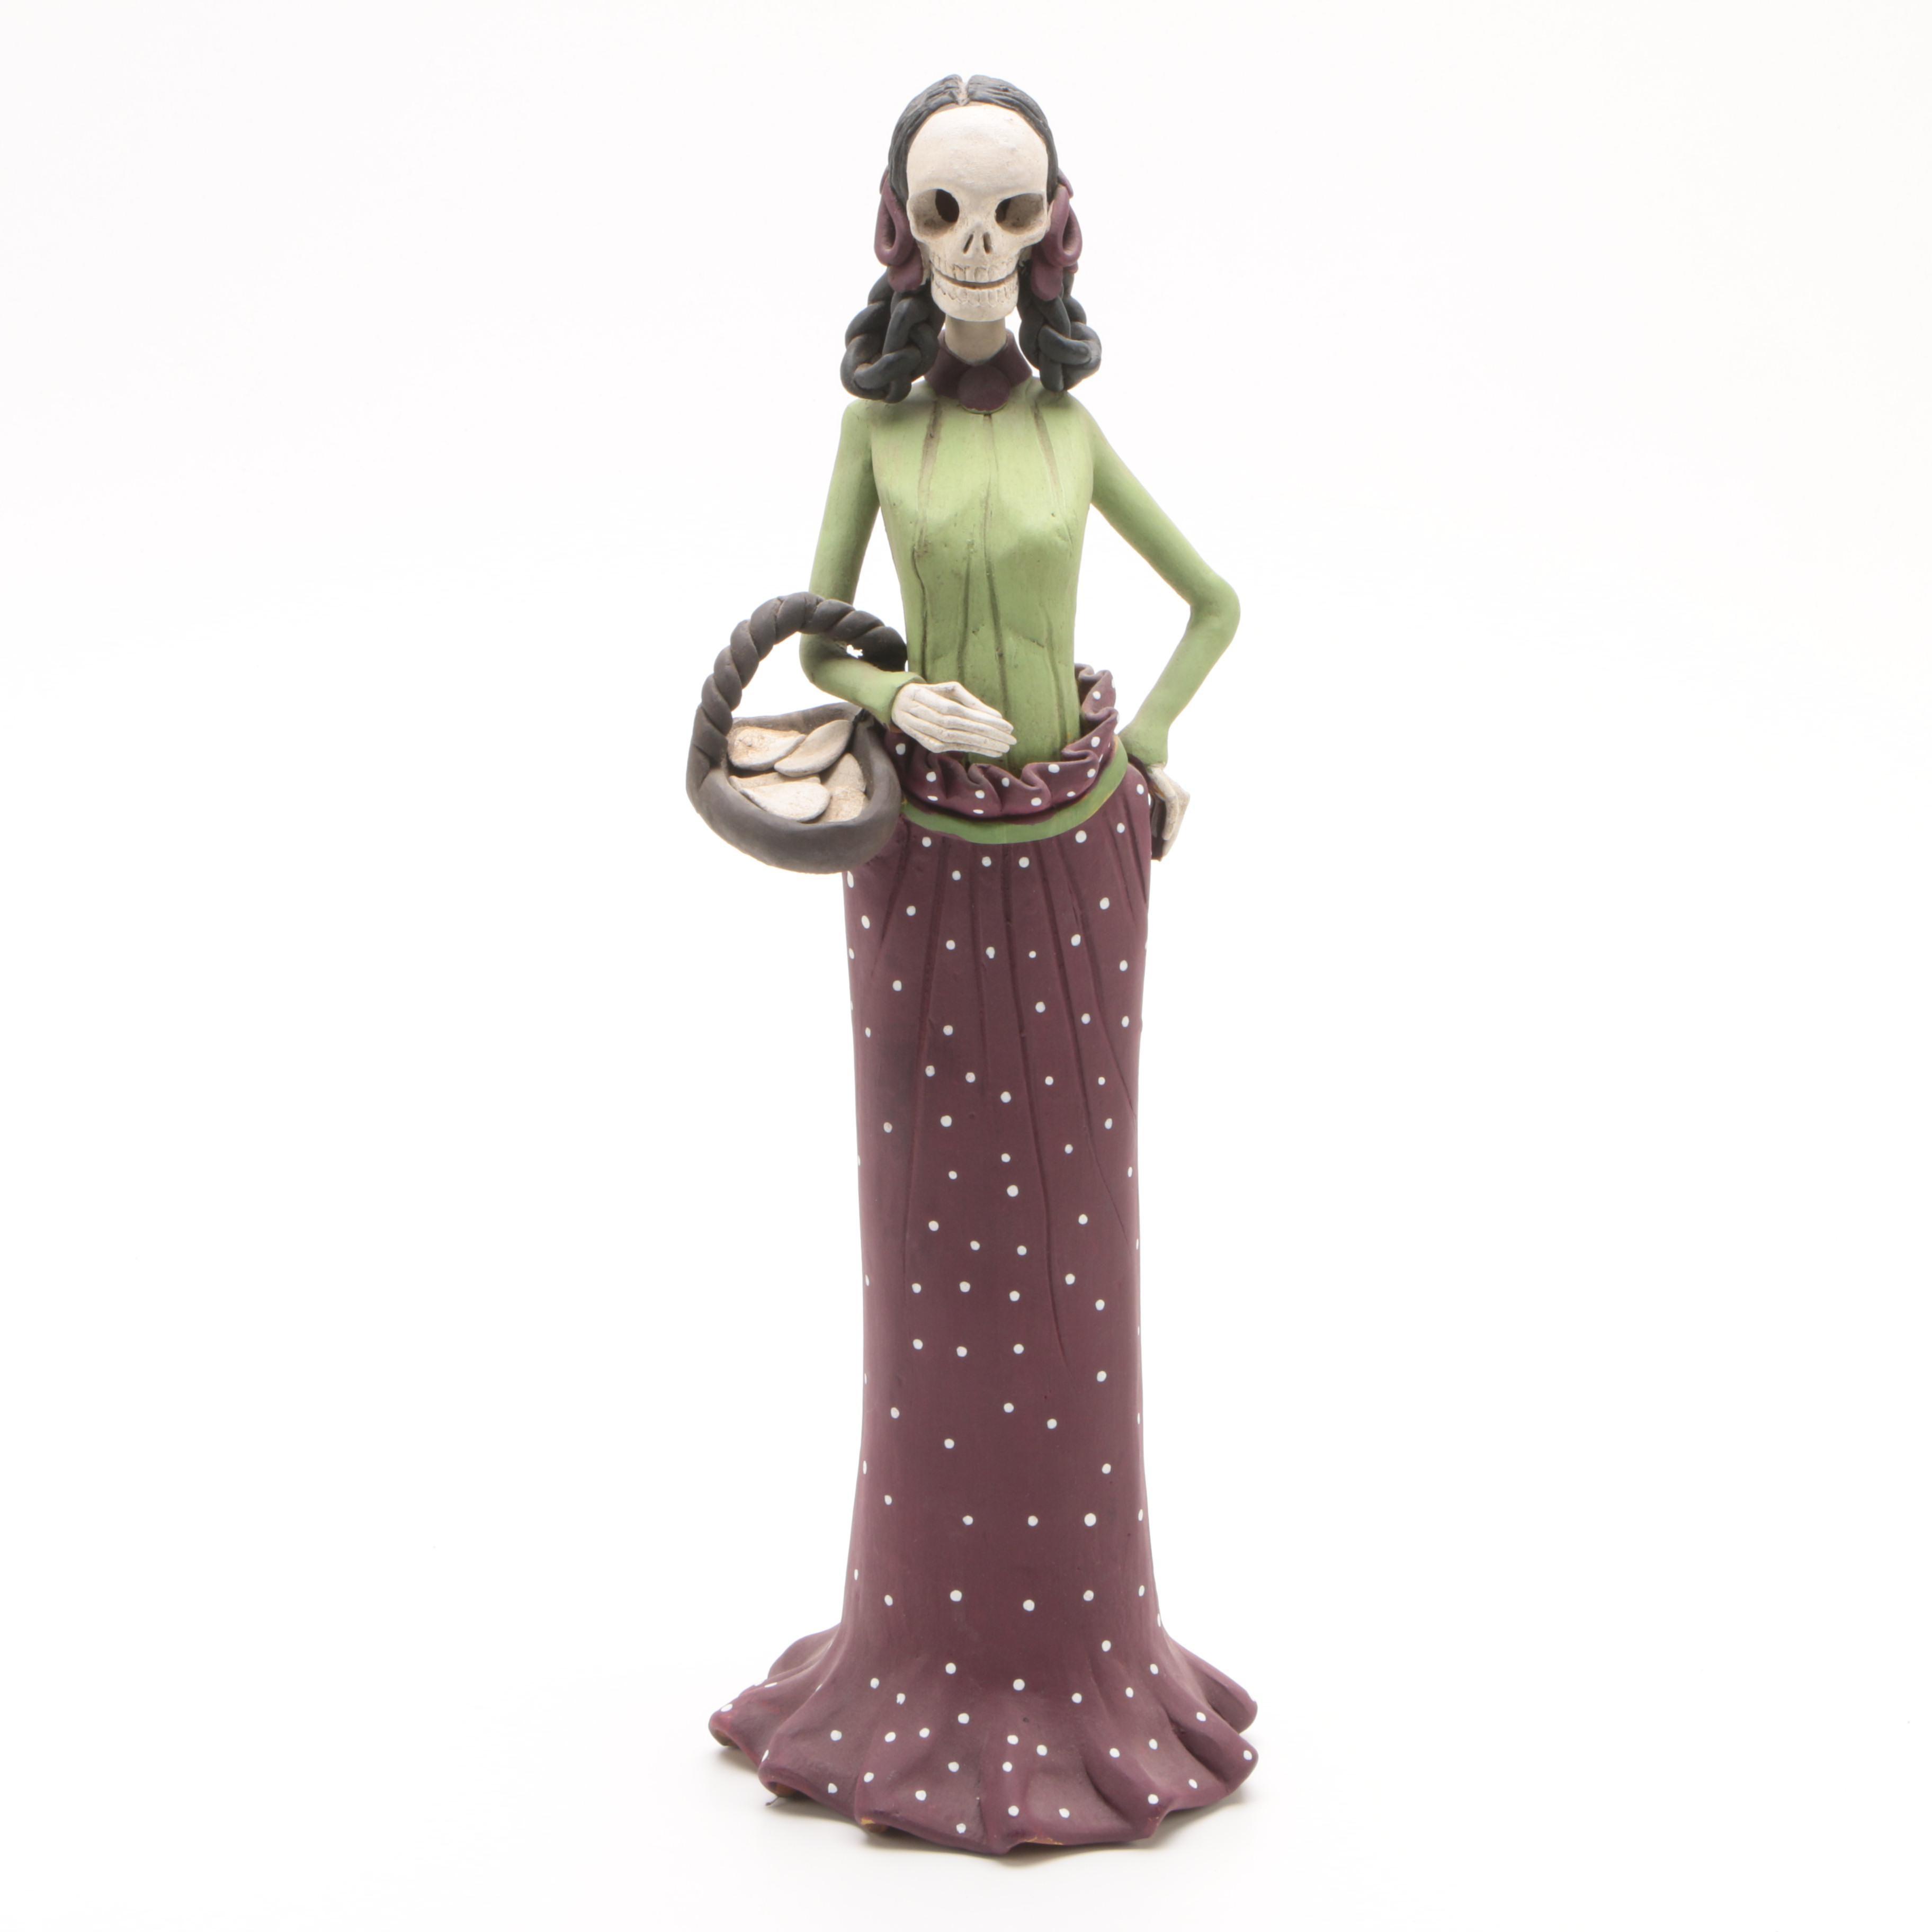 Mexican Día de Muertos Hand-Painted Terracotta Figurine